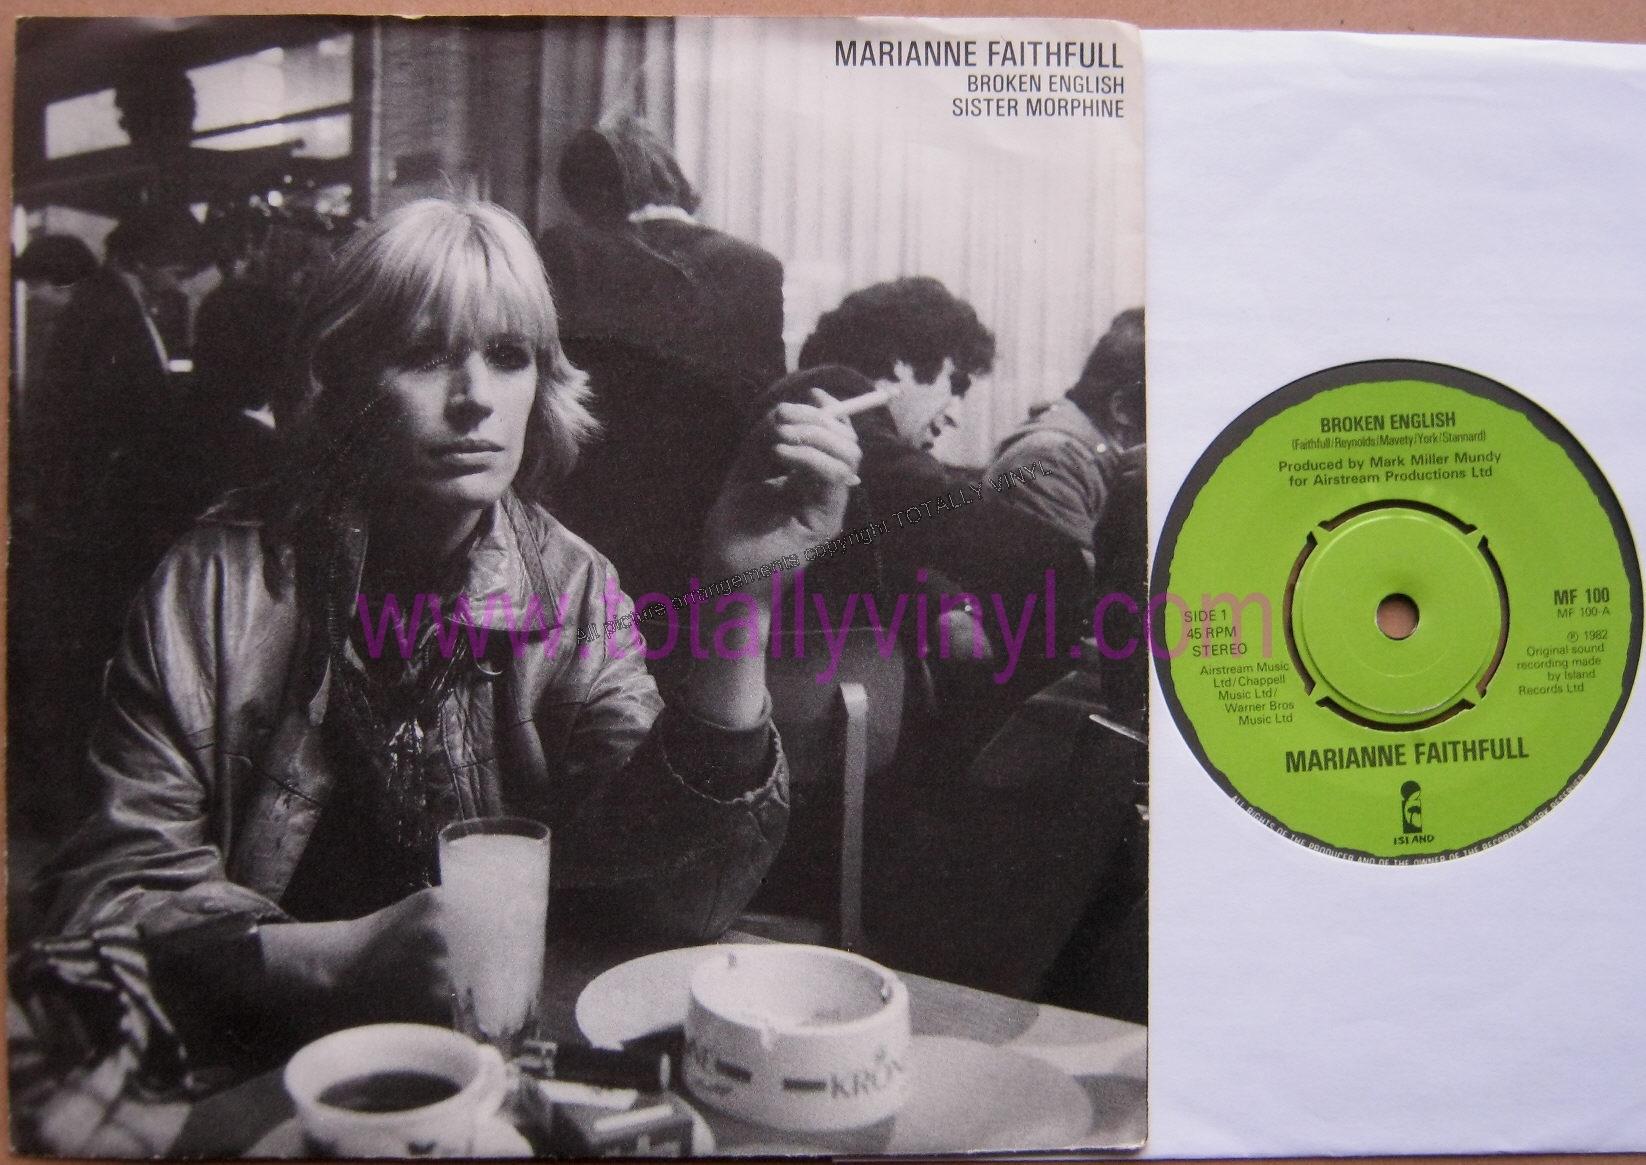 Marianne Faithfull 80s Faithfull  marianne - broken english sister    Marianne Faithfull 80s